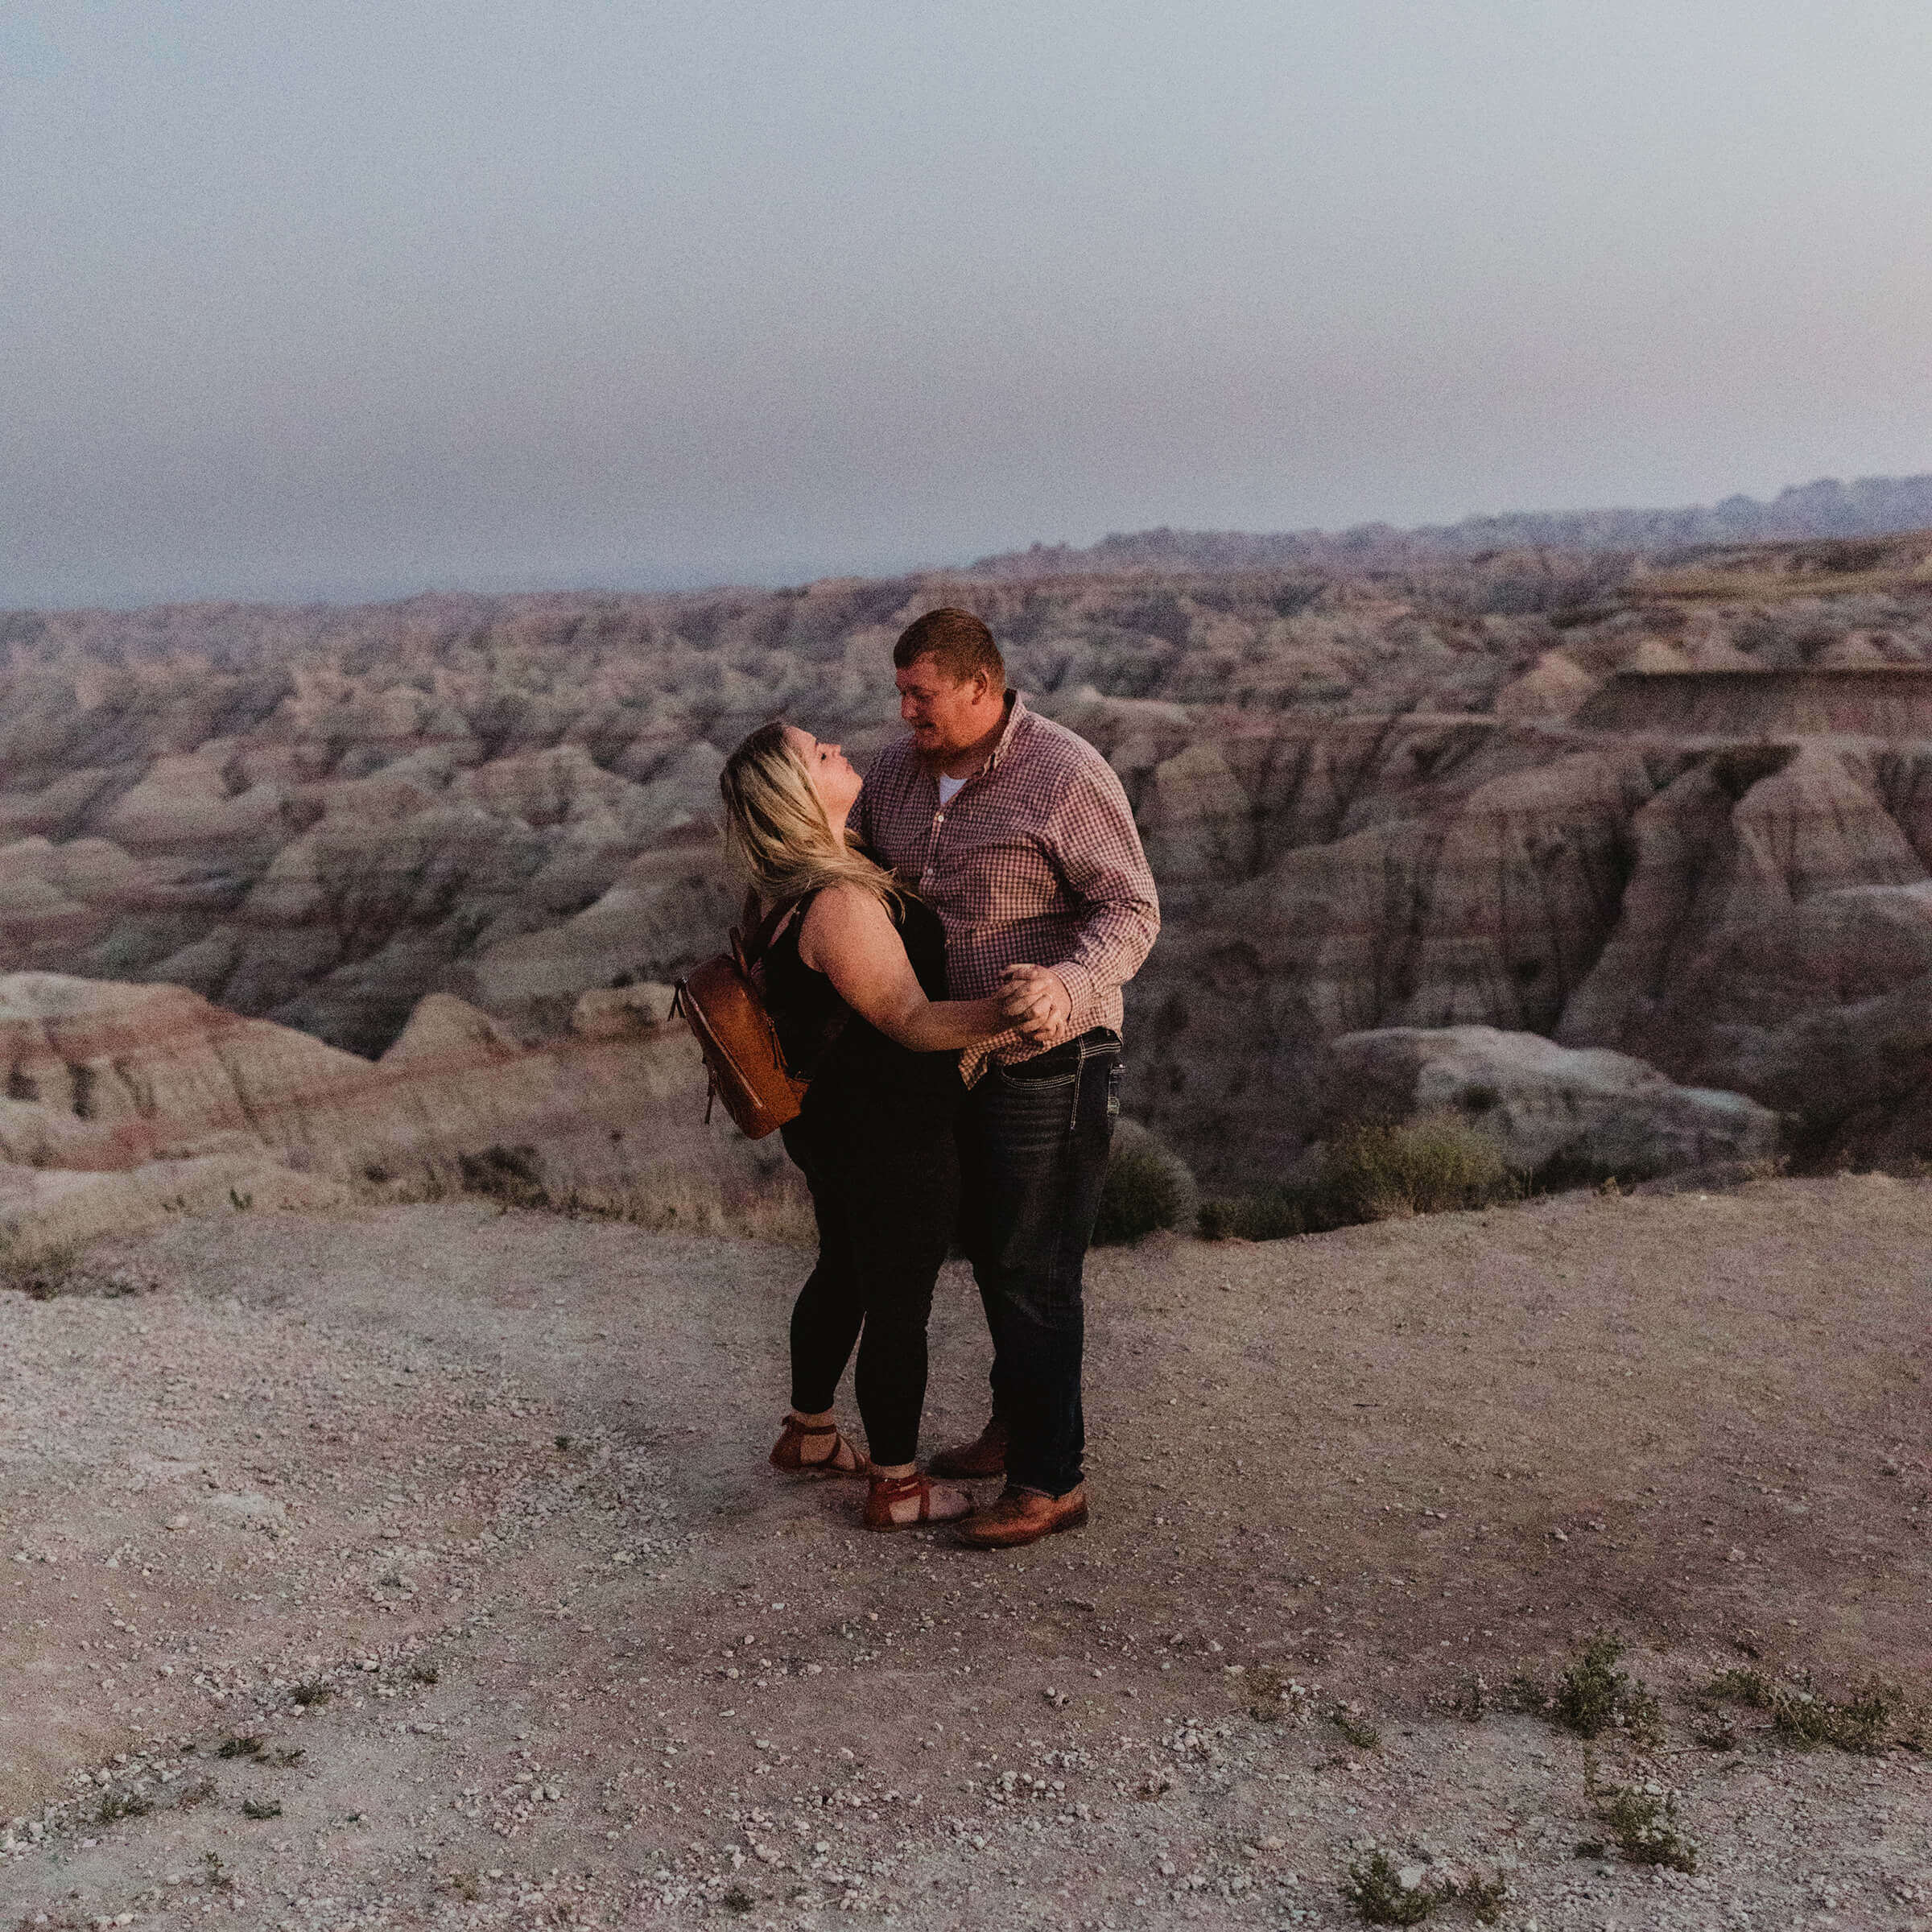 Kim & Connor at the Badland's National Park in South Dakota